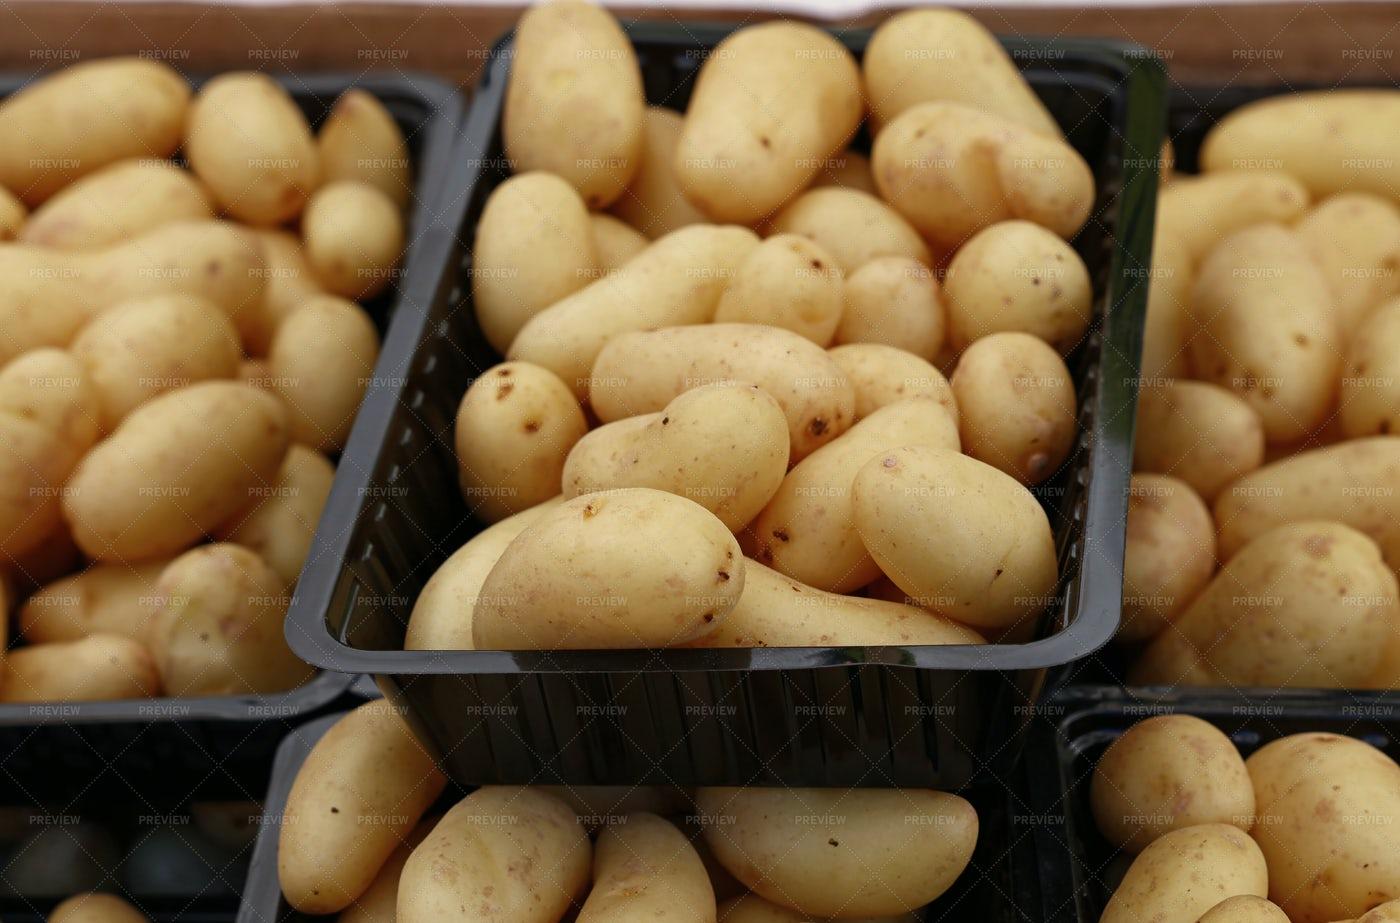 Potatoes In Box: Stock Photos